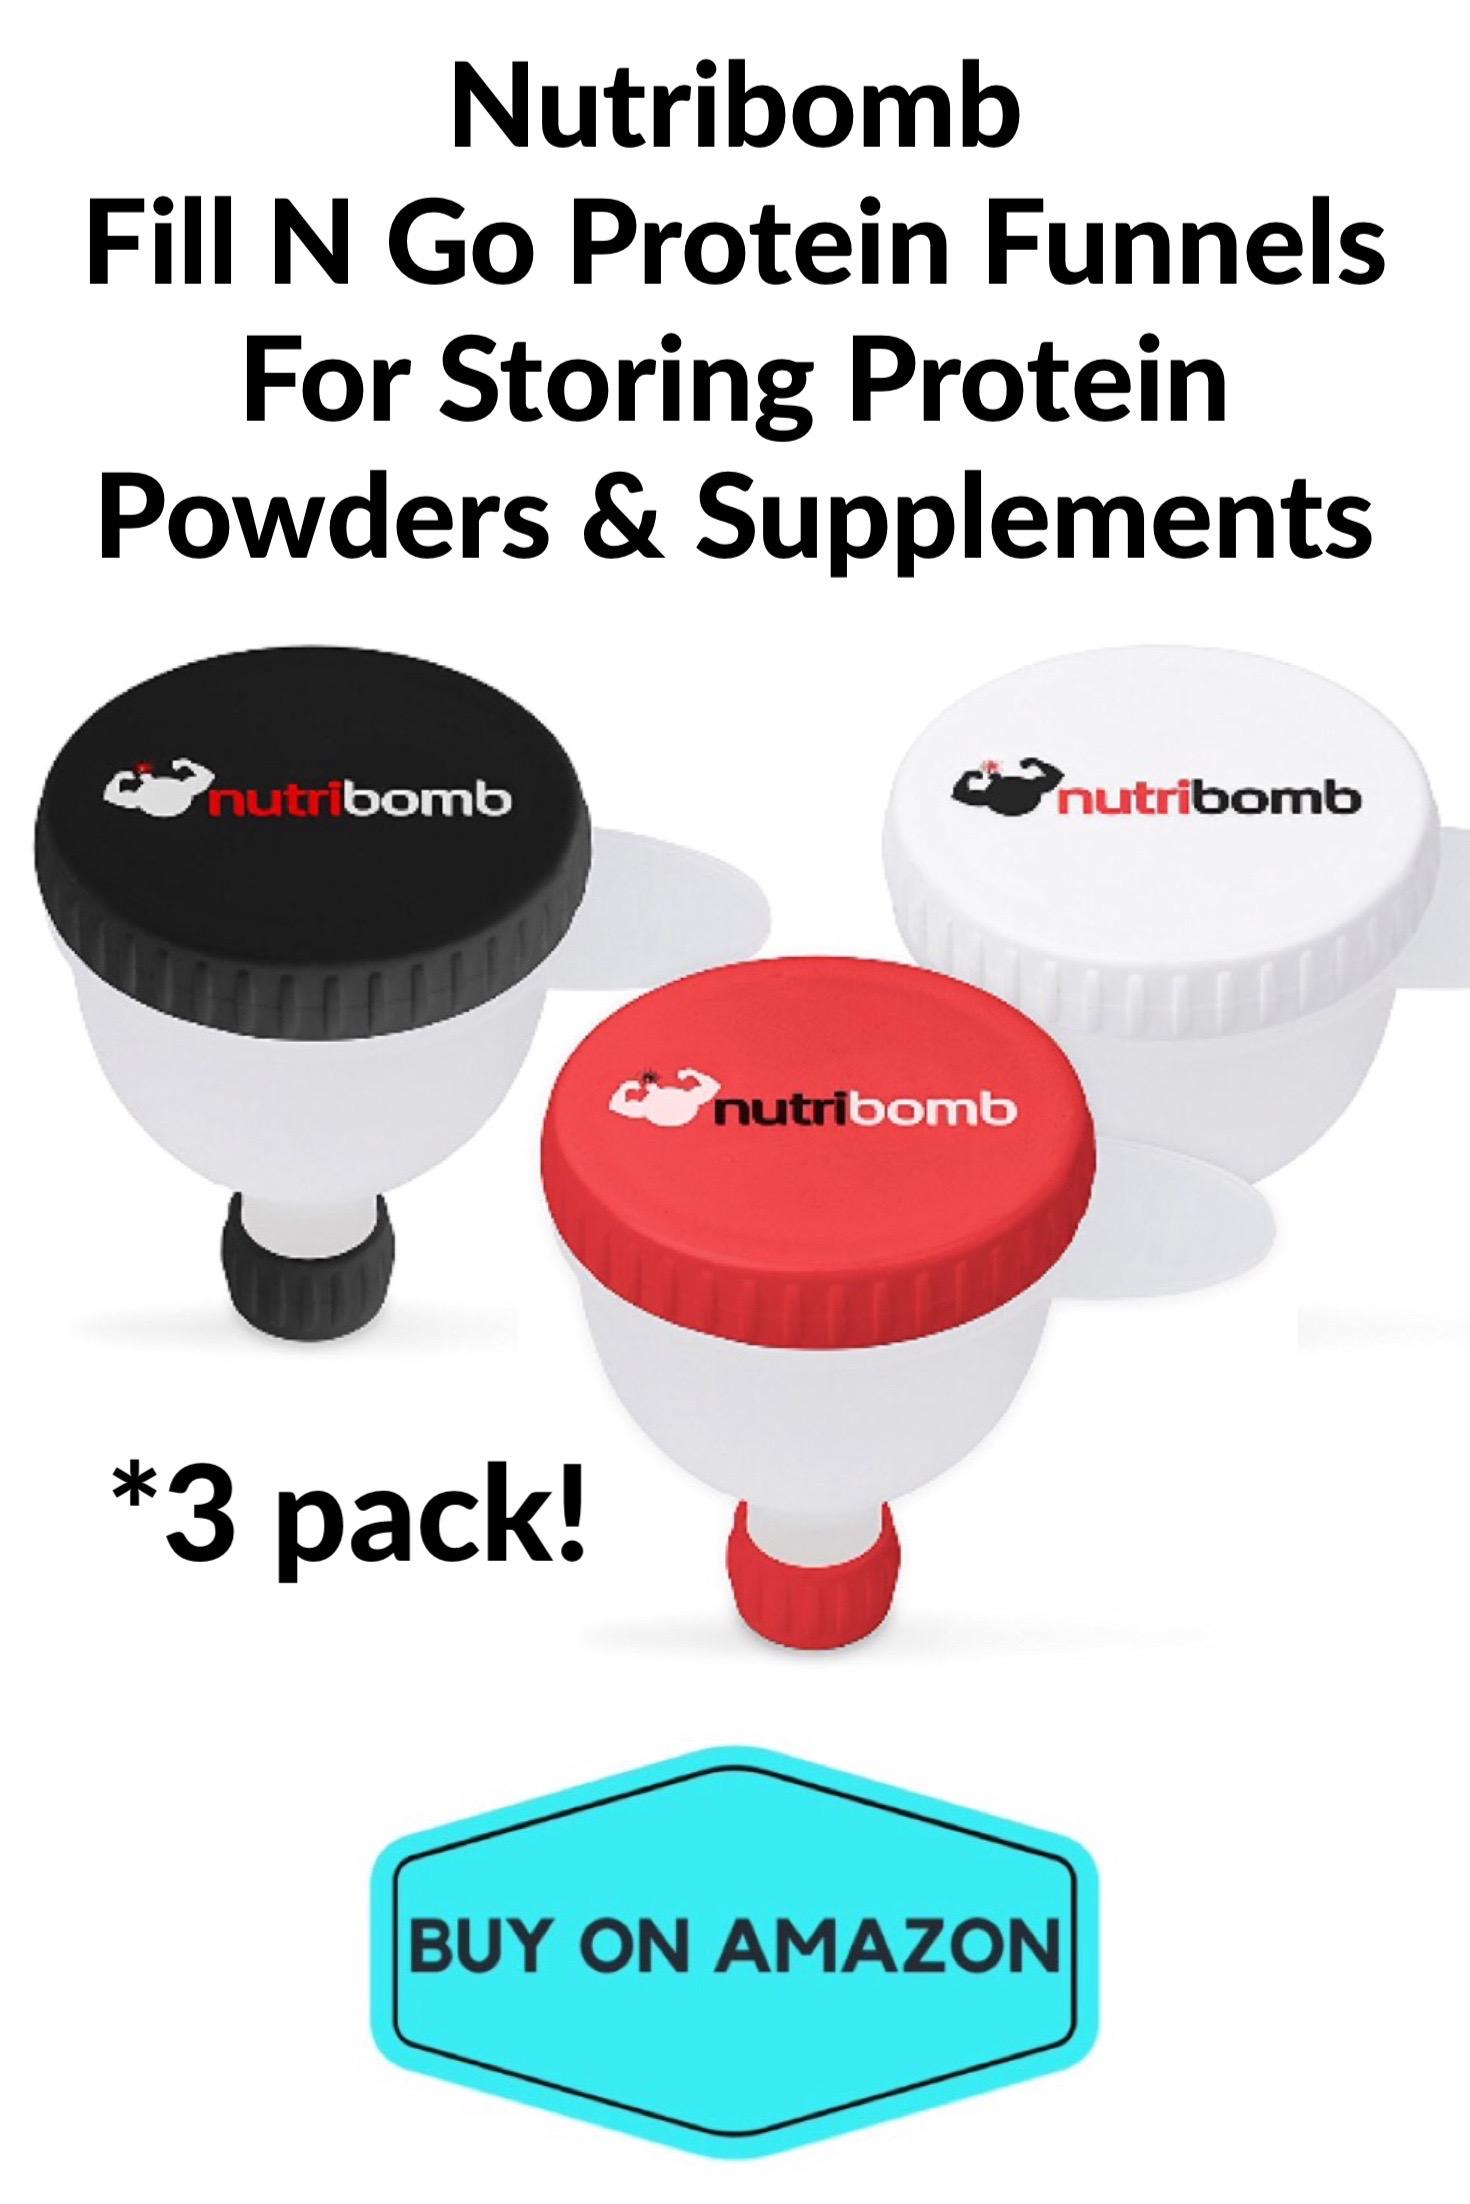 Nutribomb Fill-N-Go Protein Funnels